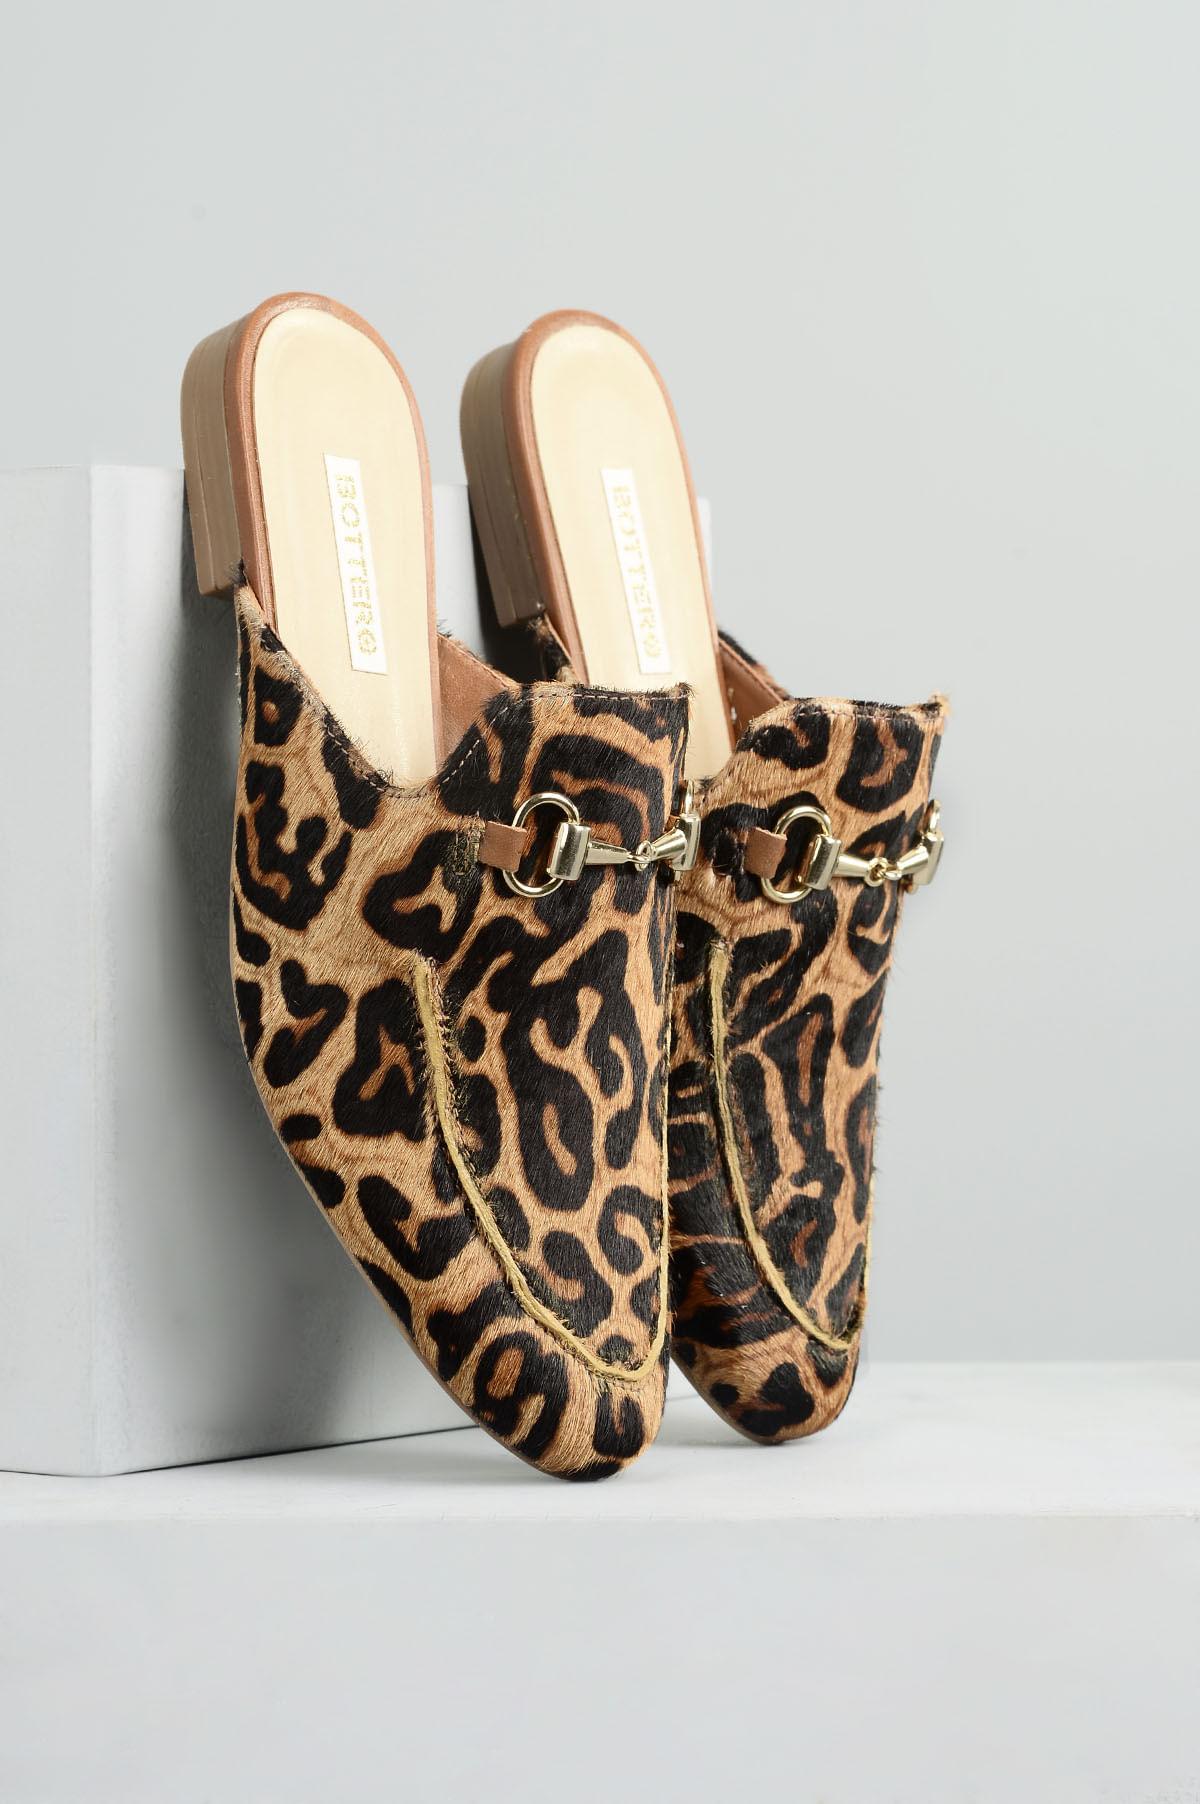 bdc0c7576 Mule Feminino Maryon Bottero PELO - ONCA - Mundial Calçados